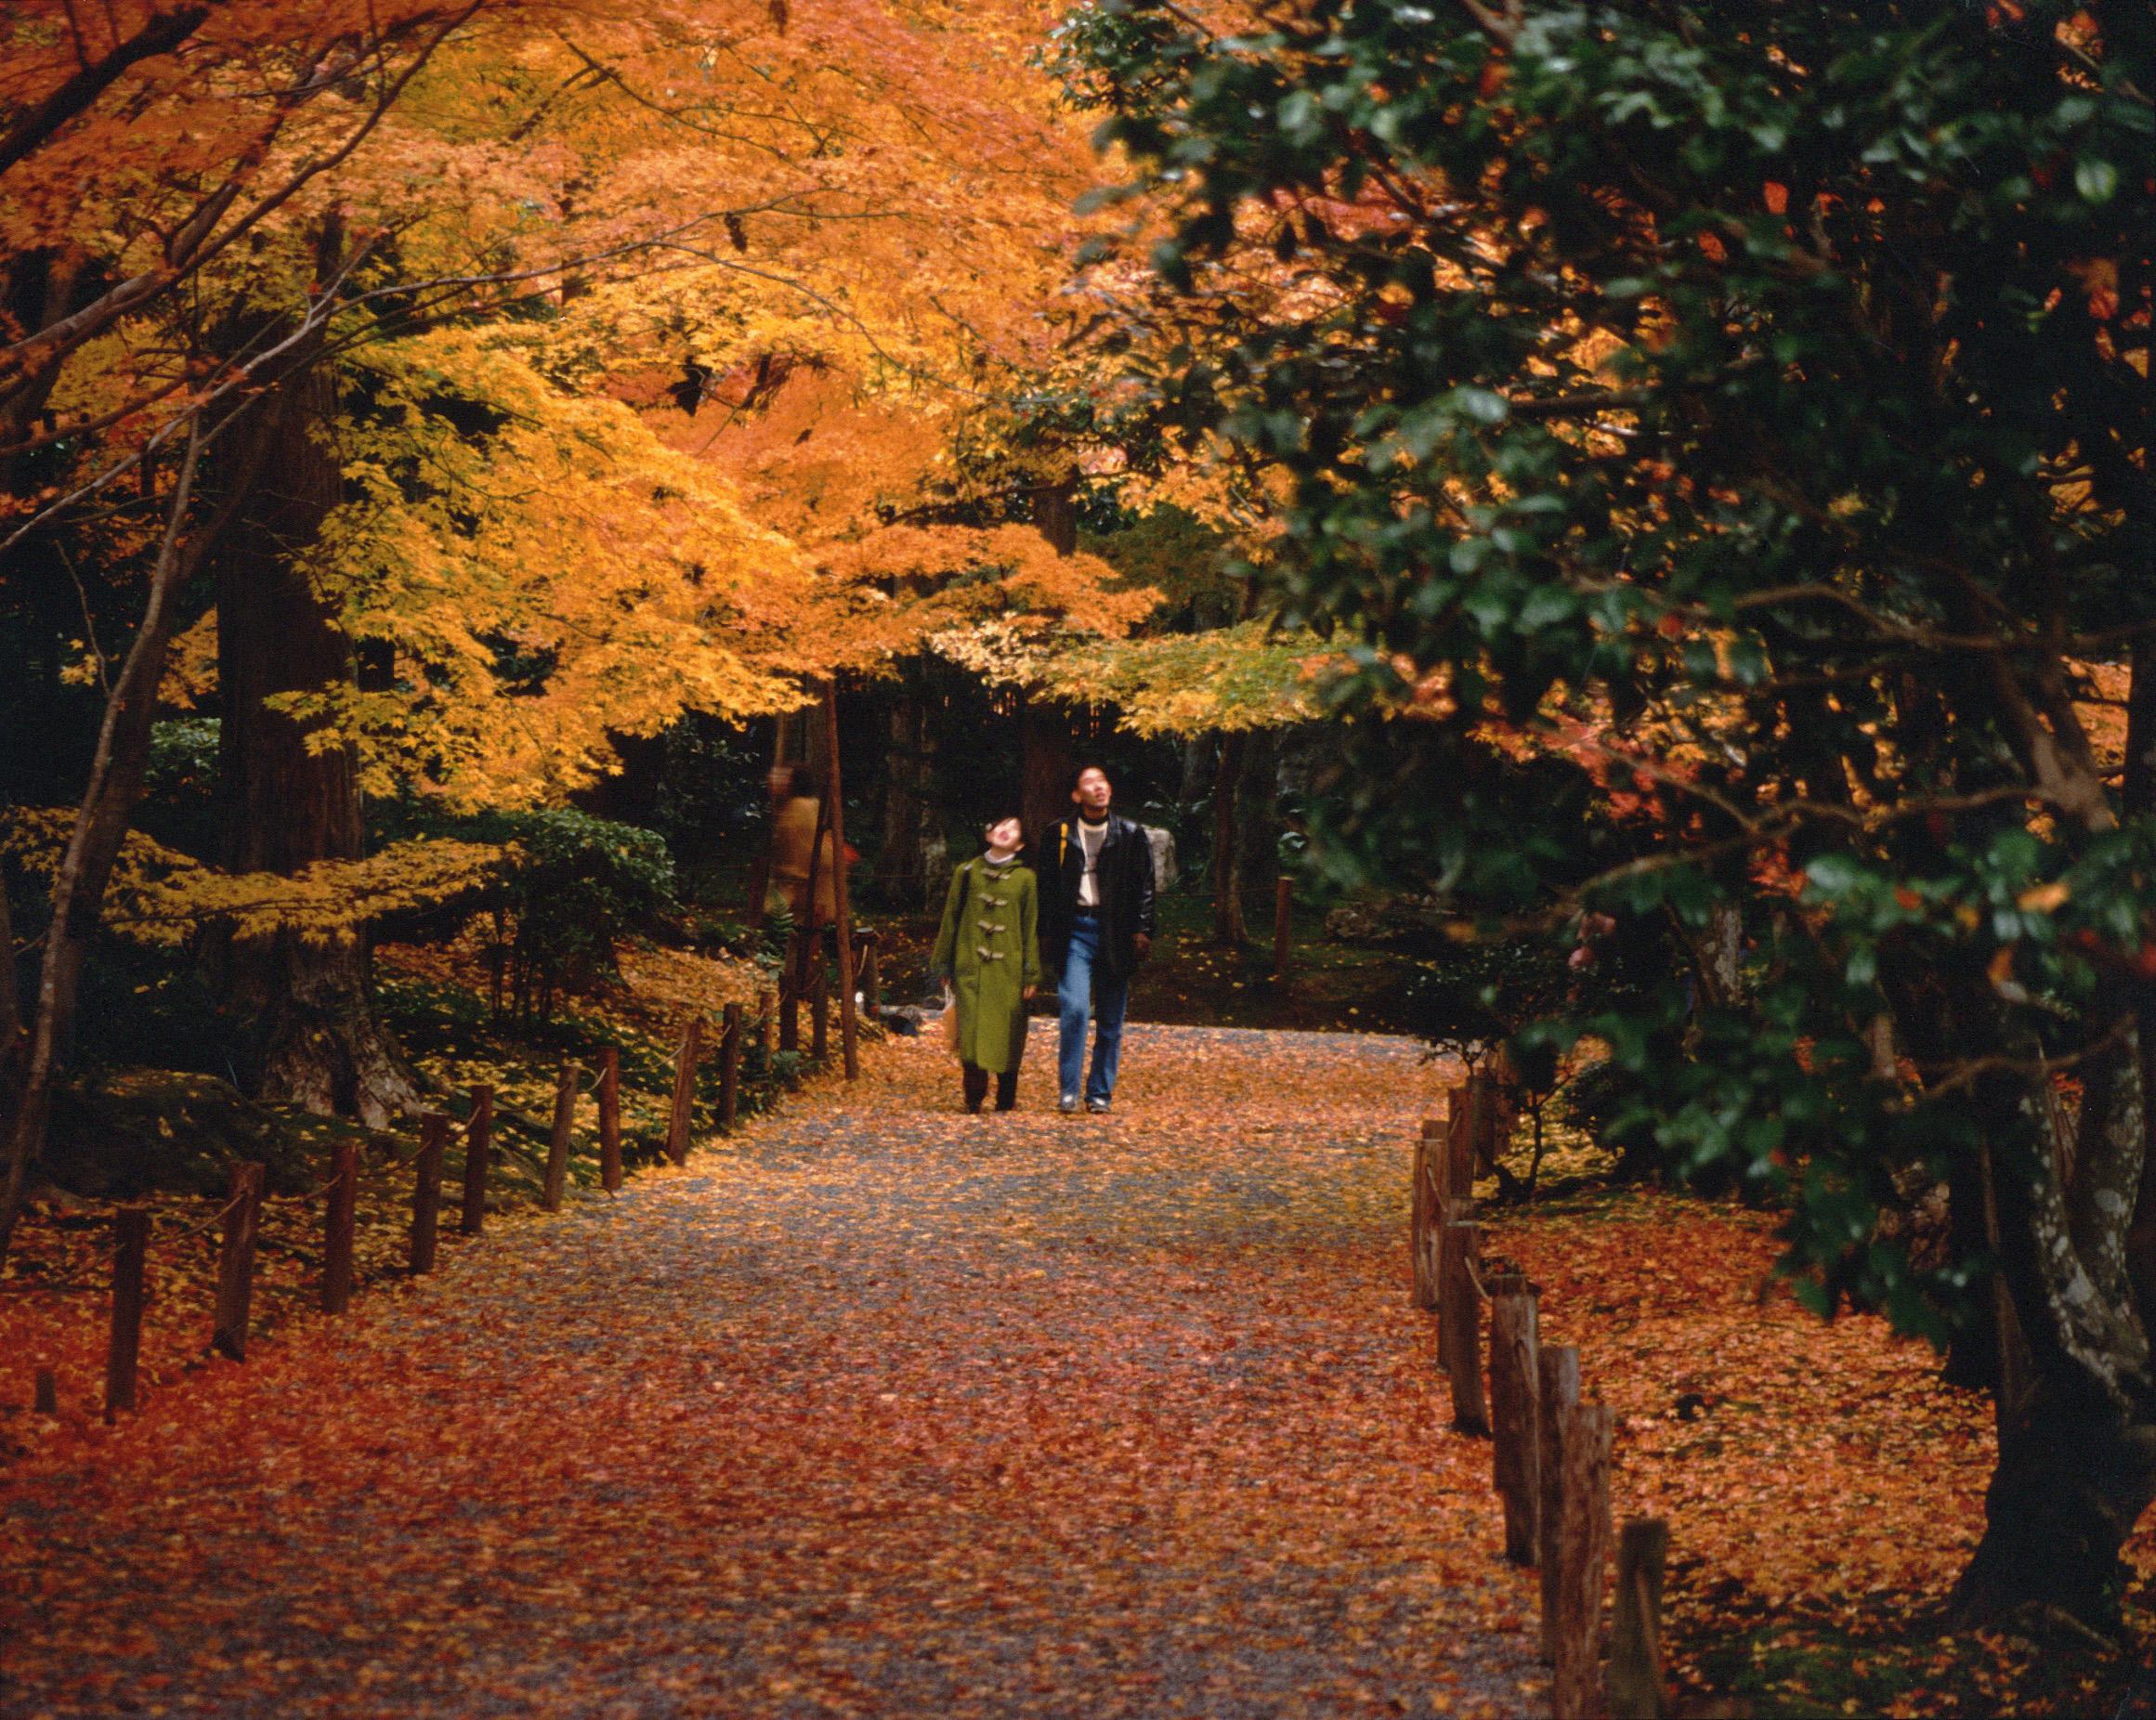 acer momiji no jardim japonês;jardim japones, jardim japonês